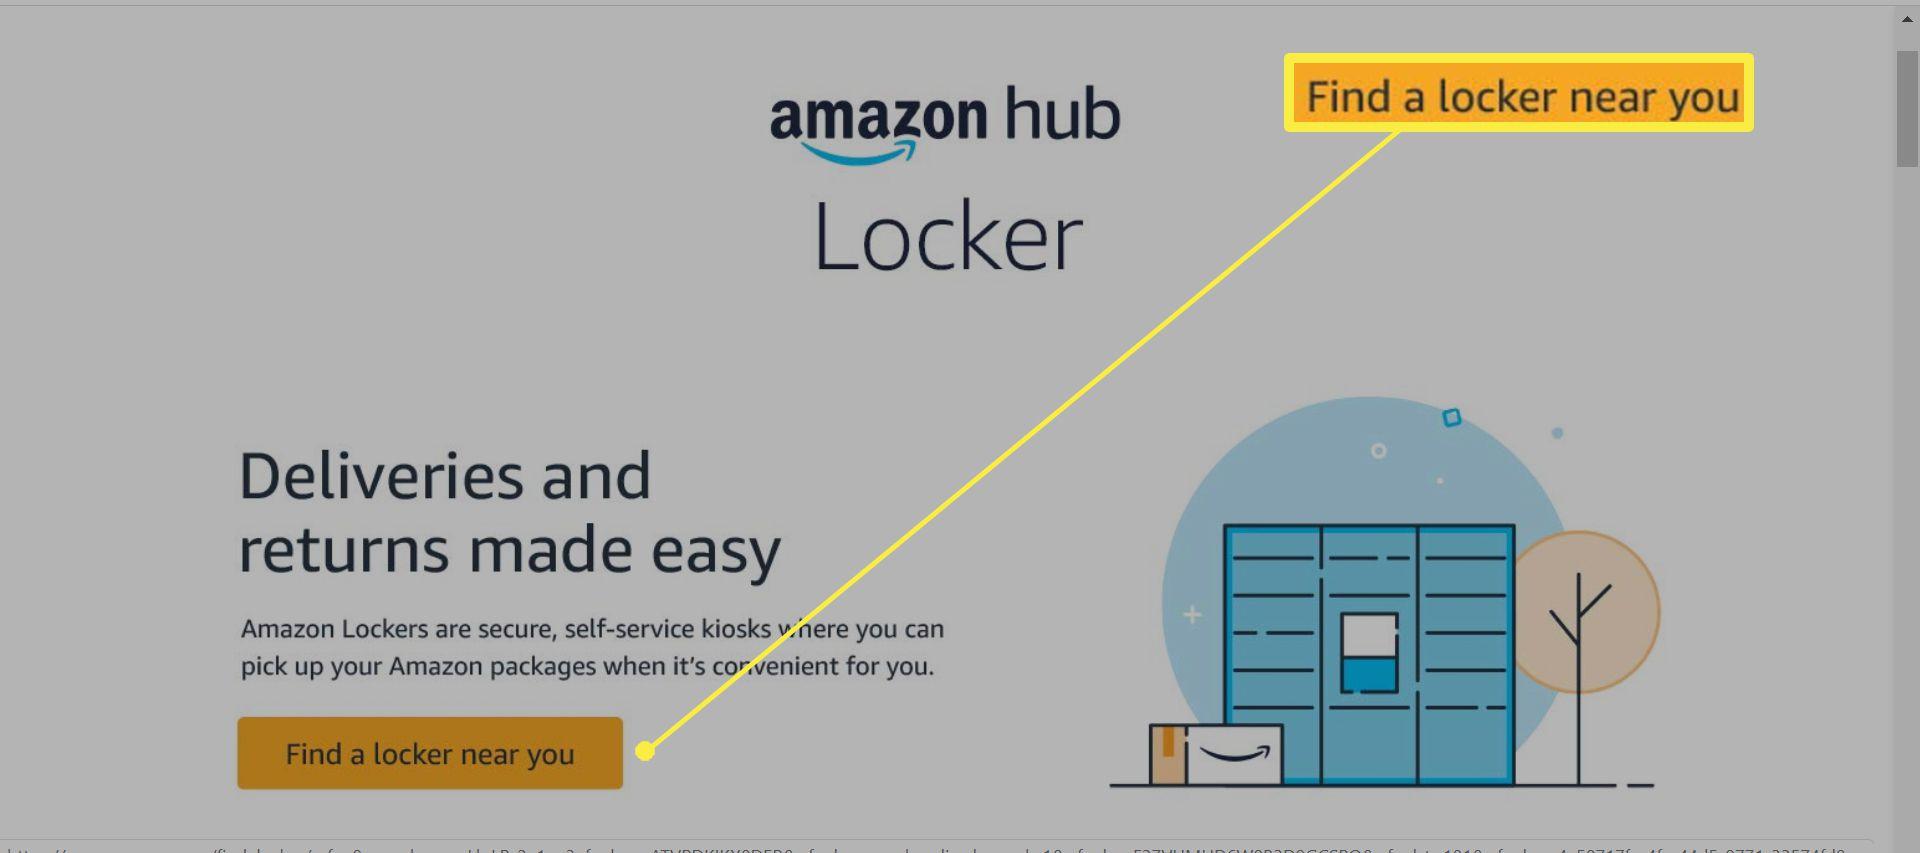 Amazon Locker delivery page.